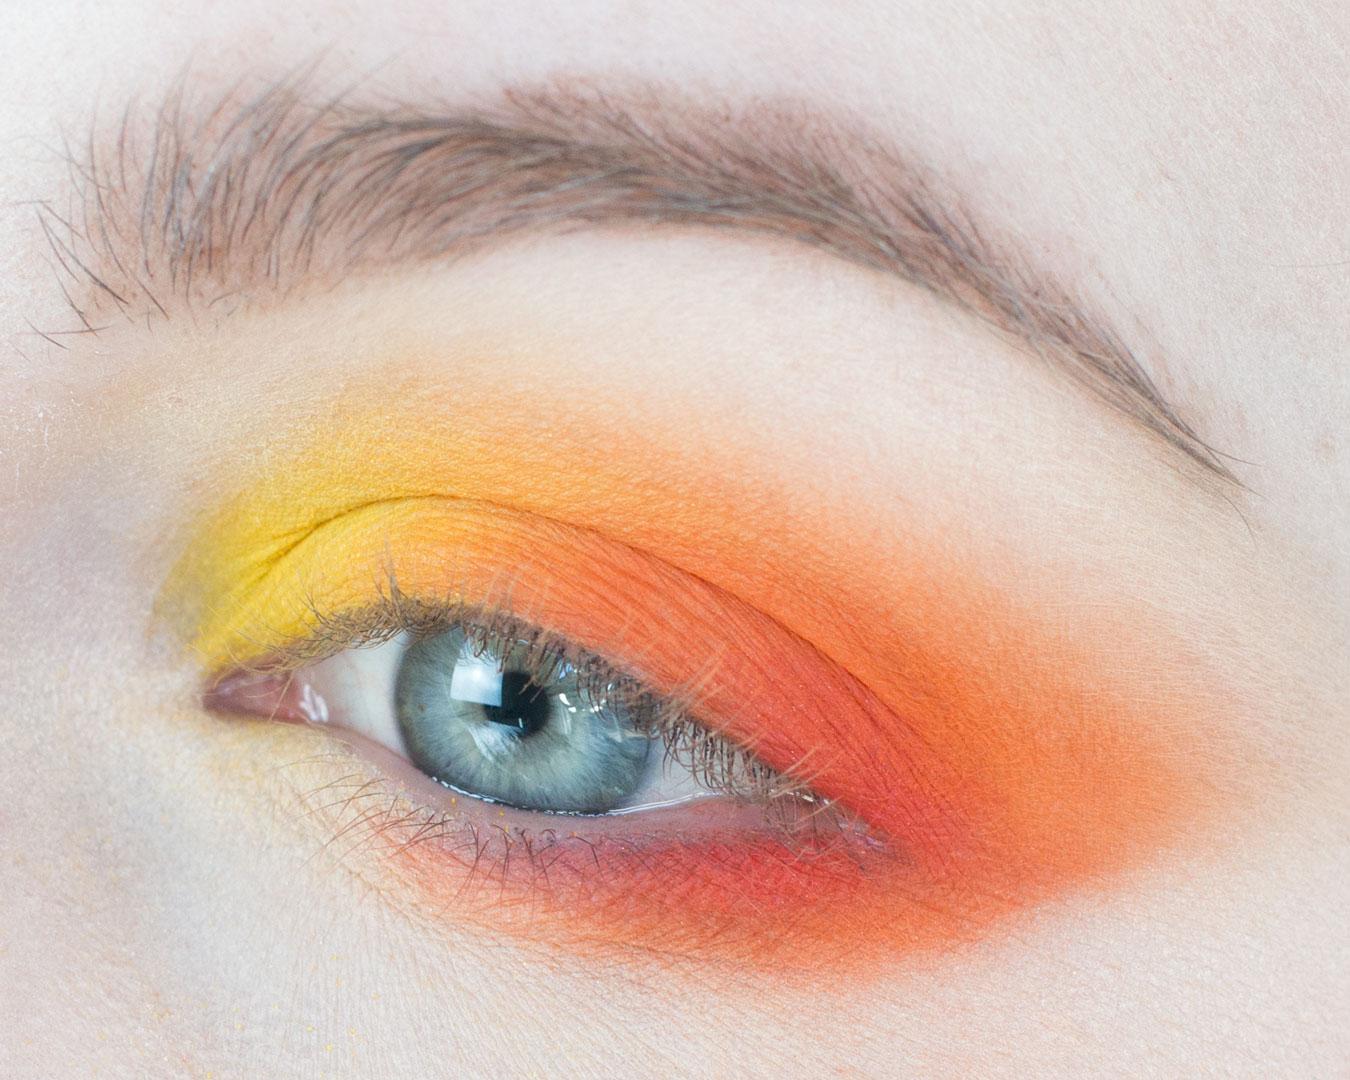 ed, Orange, Yellow Analogous Makeup Look with Education on Analogous Color Harmonies